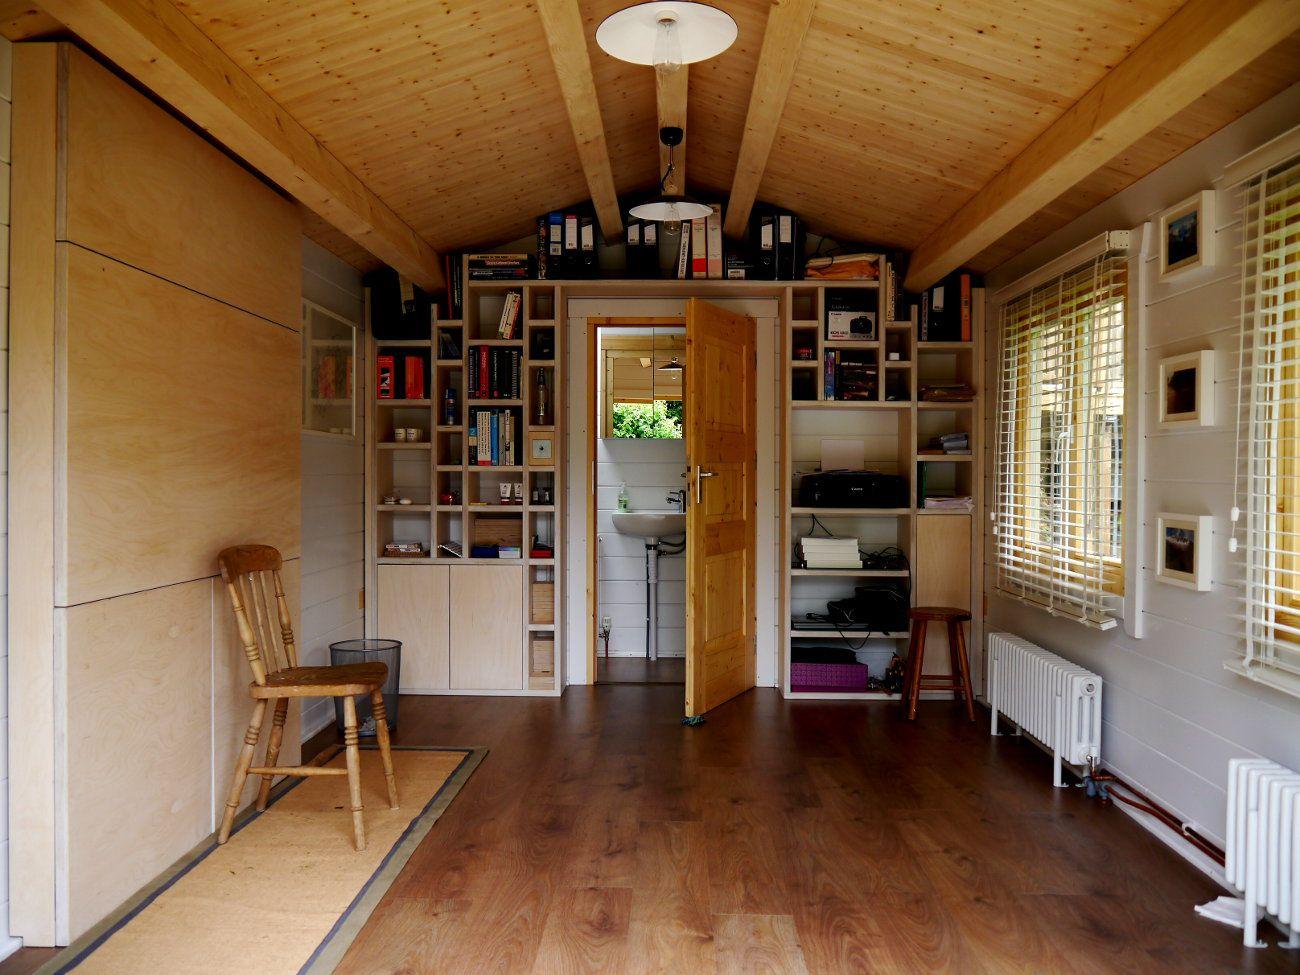 garden office designs interior ideas. Garden Office Interior Designs Ideas Pinterest